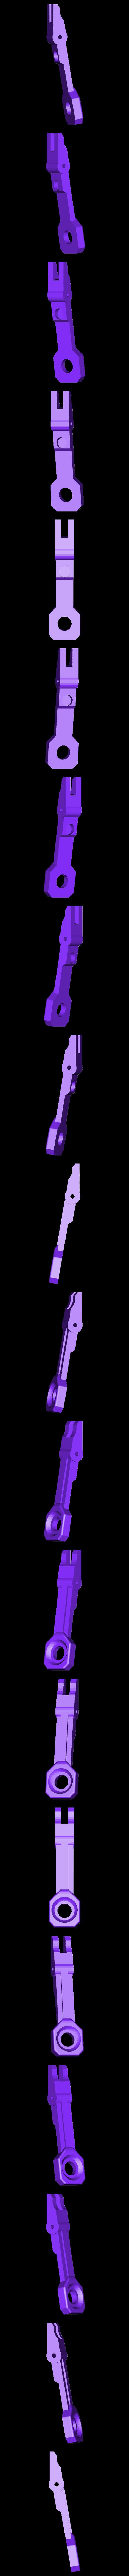 CE3_DMAG_MAGWELL_T_L_PART_v4.stl Download free STL file SAR12 DMAG MAG adapter ABD • 3D printing design, UntangleART